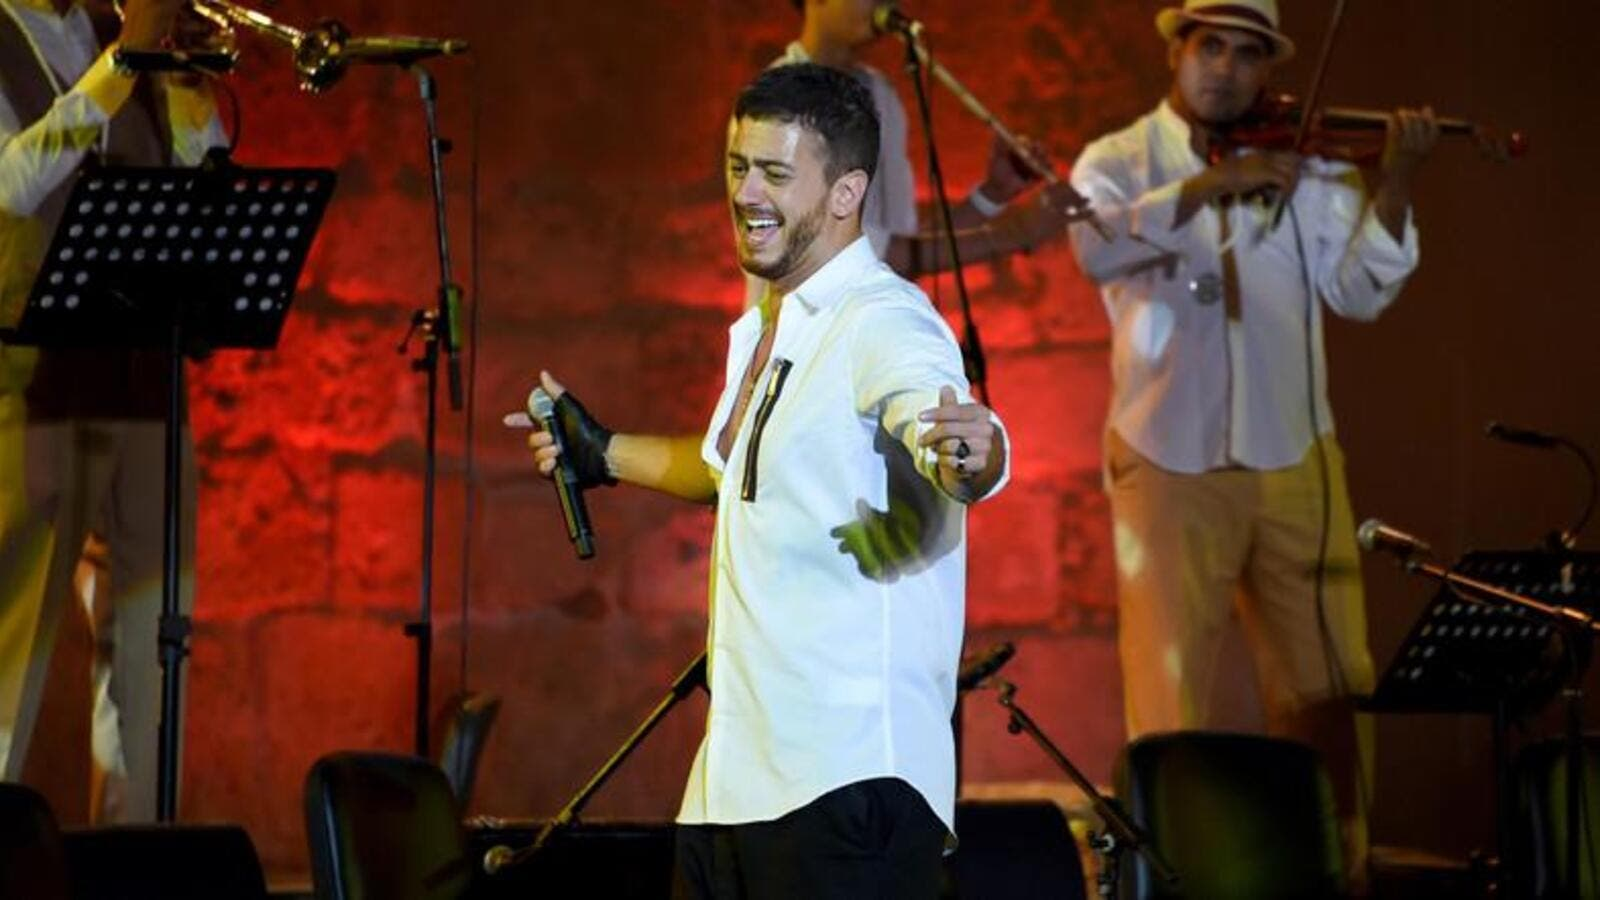 Moroccan Singer Saad Lamjarred Just Got Reported for Rape in Paris